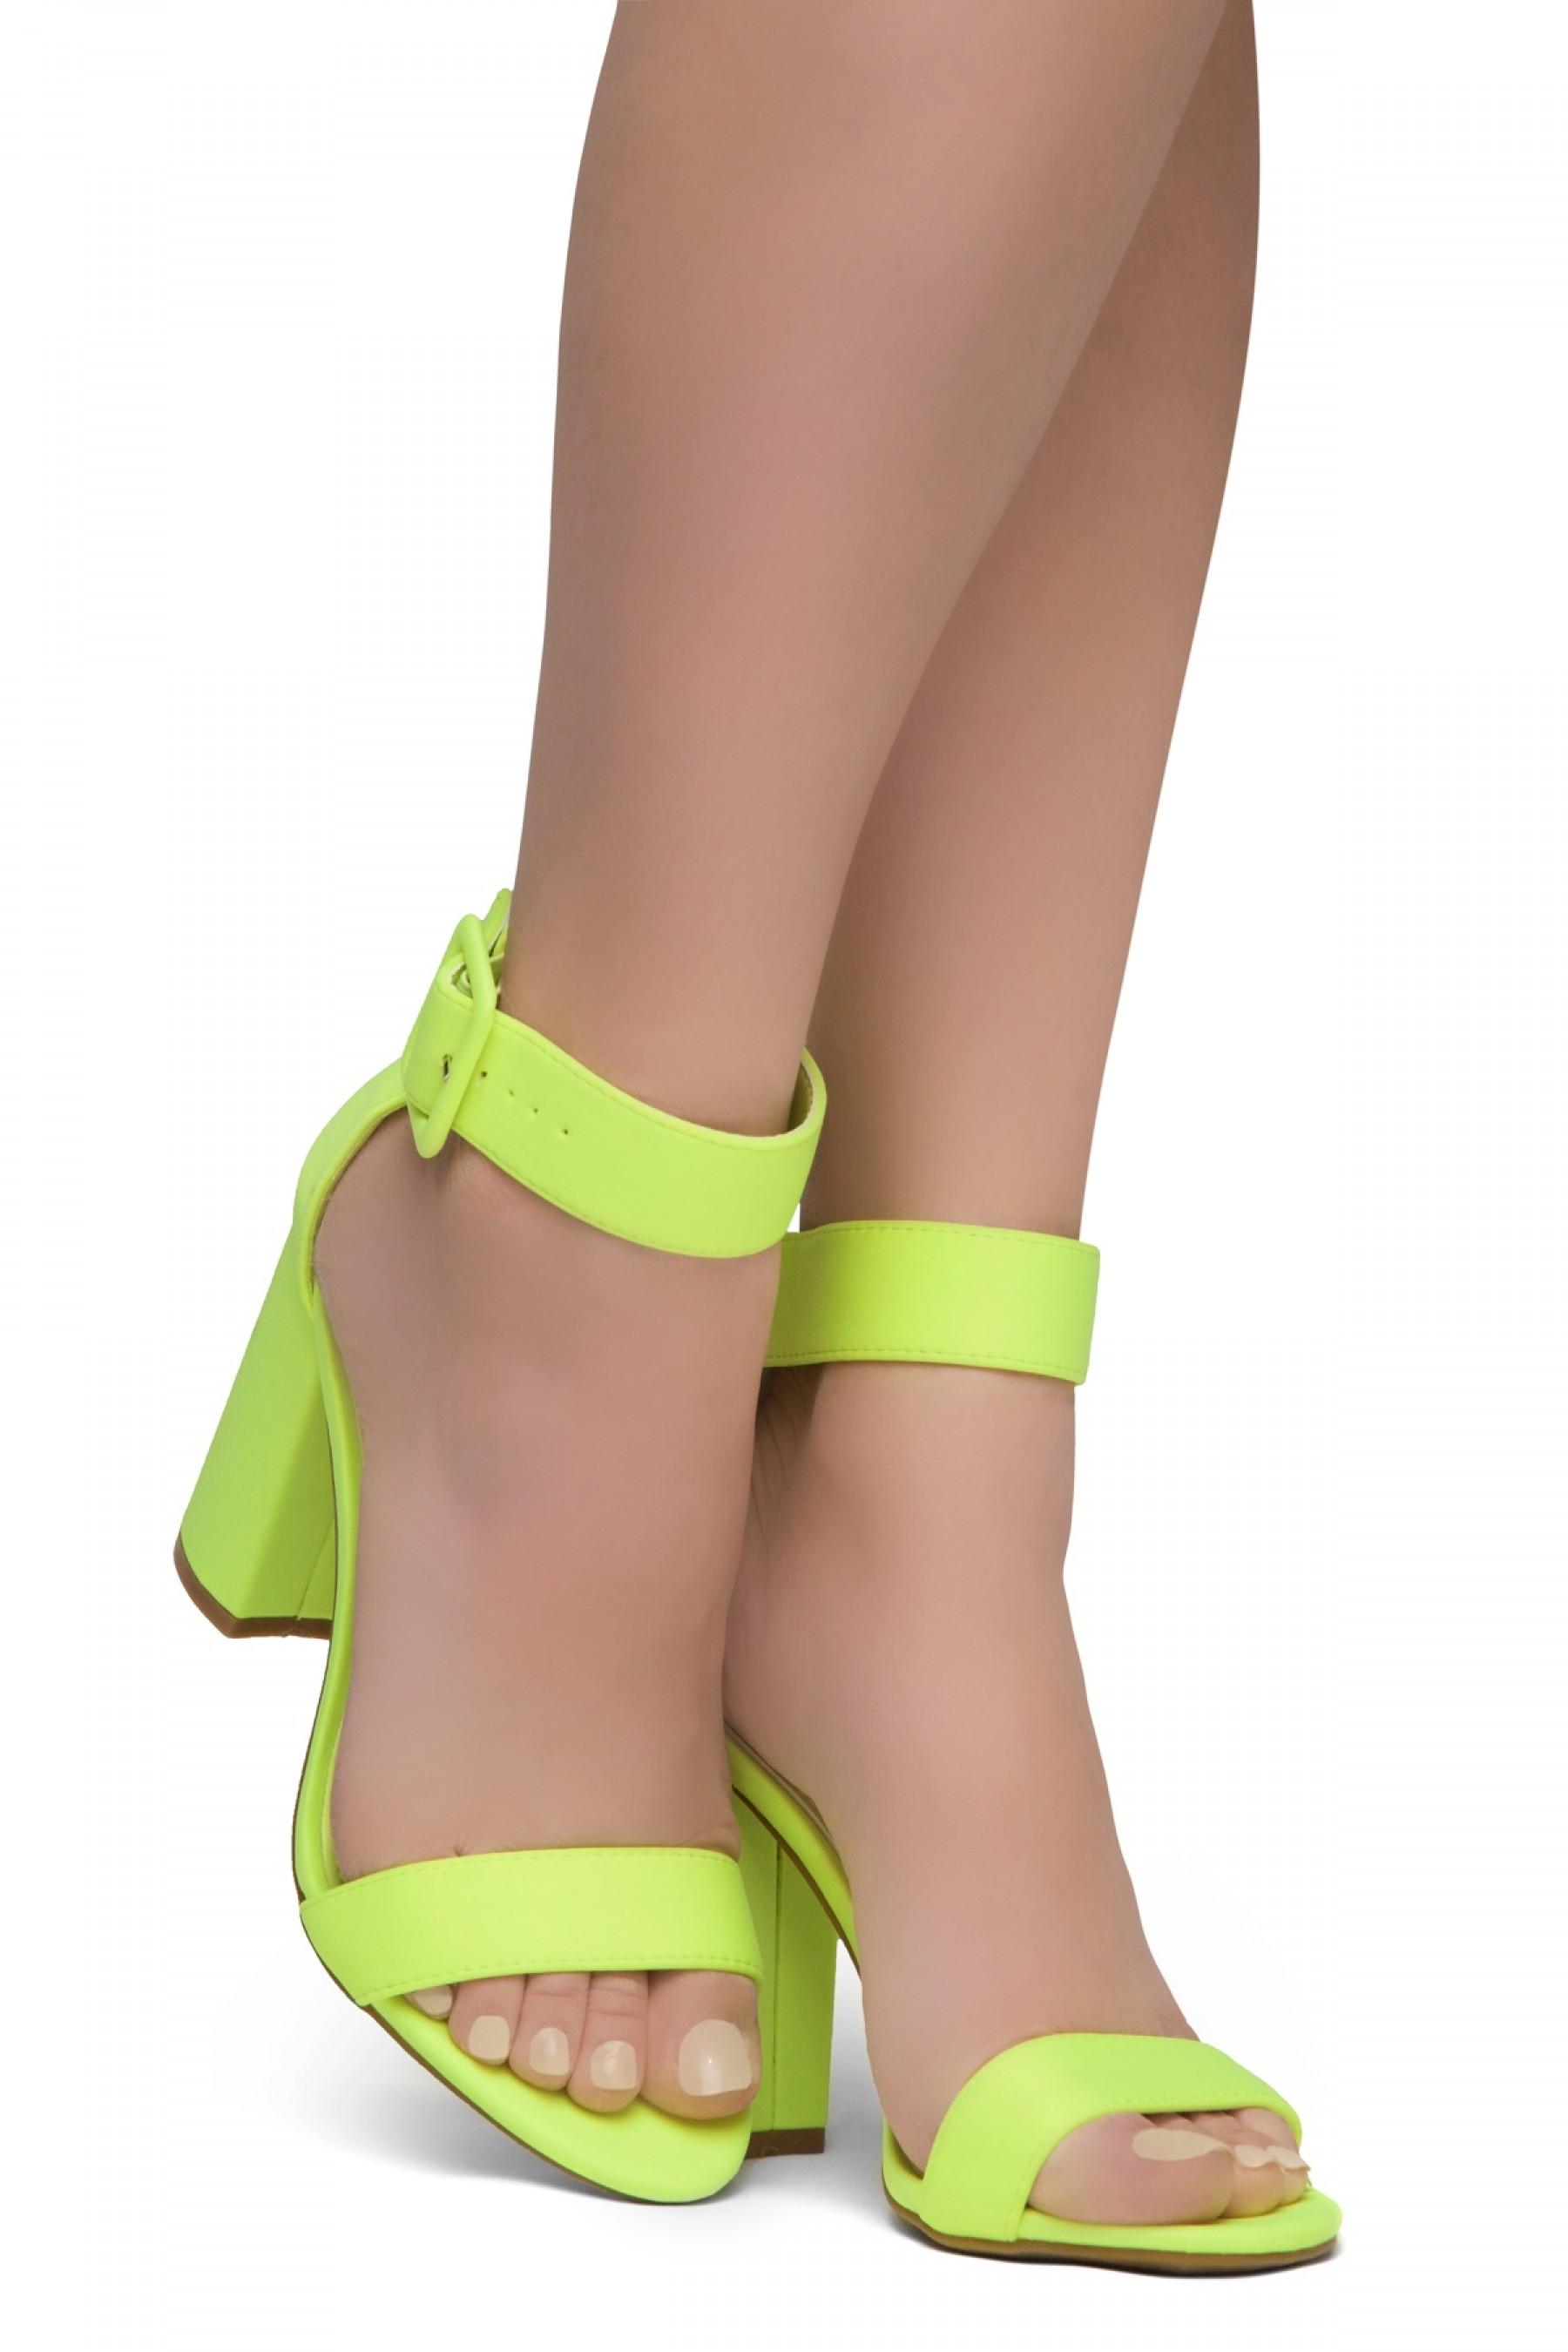 HerStyle Rumors-Chunky heel, ankle strap (LimeNeon)